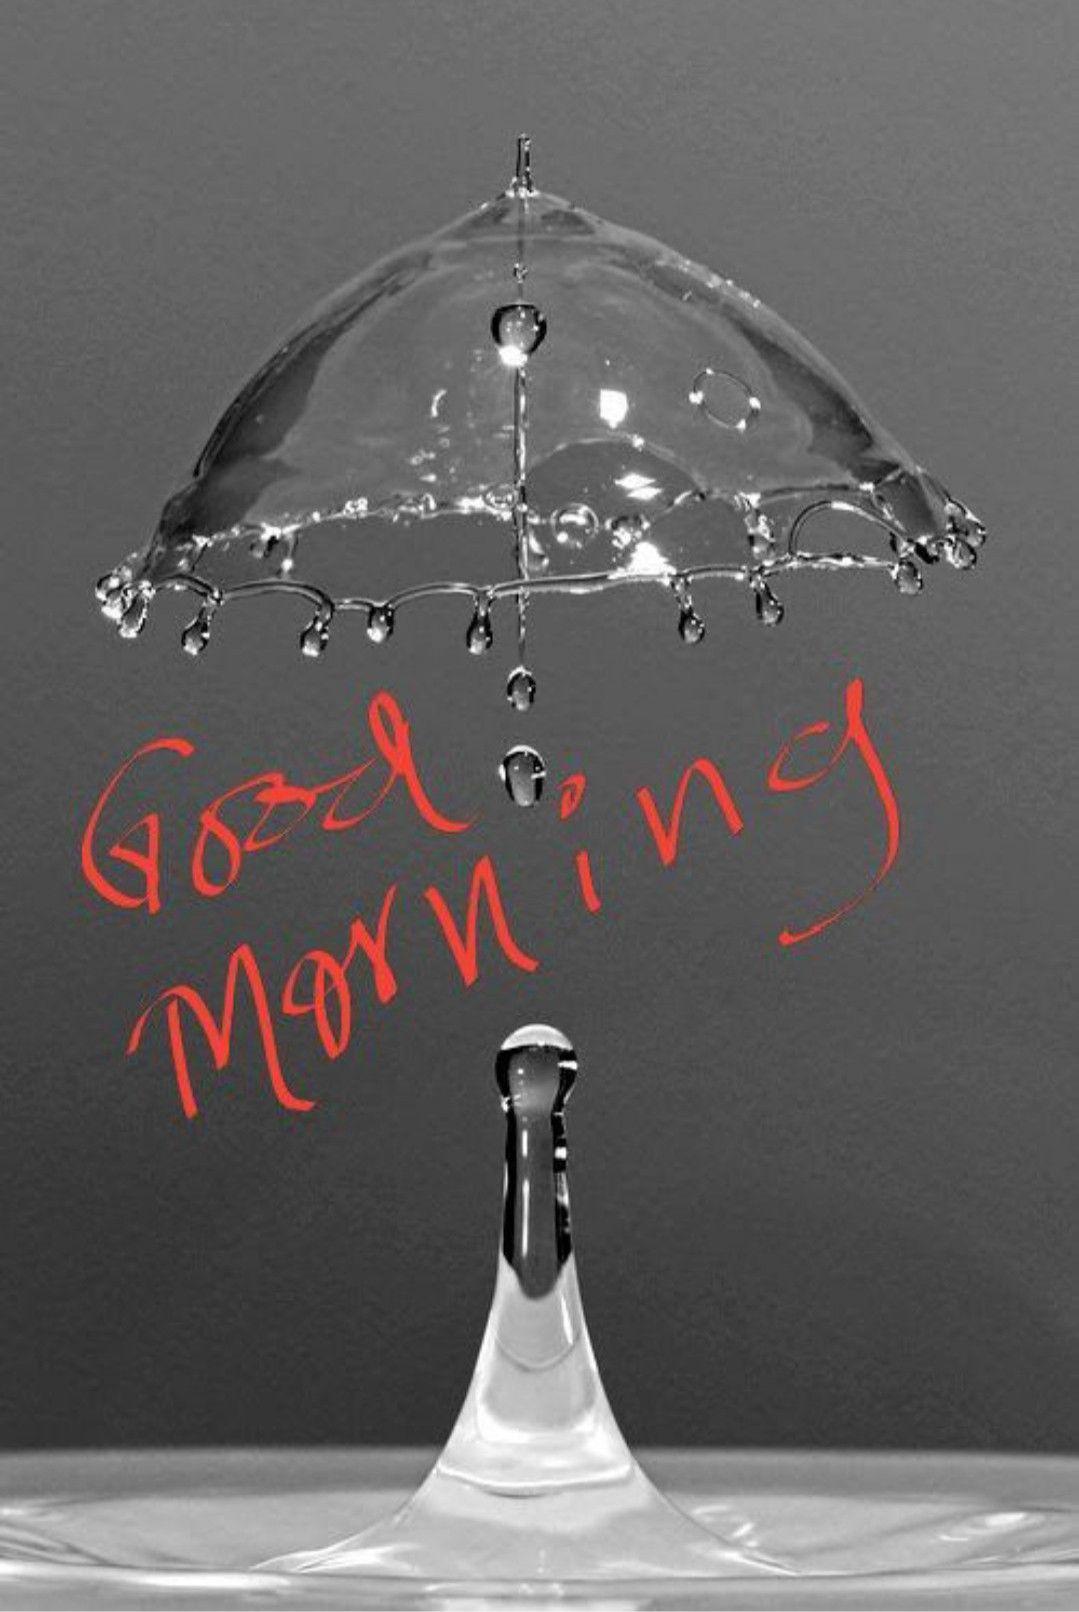 Good Morning Greetings Good morning greetings, Good